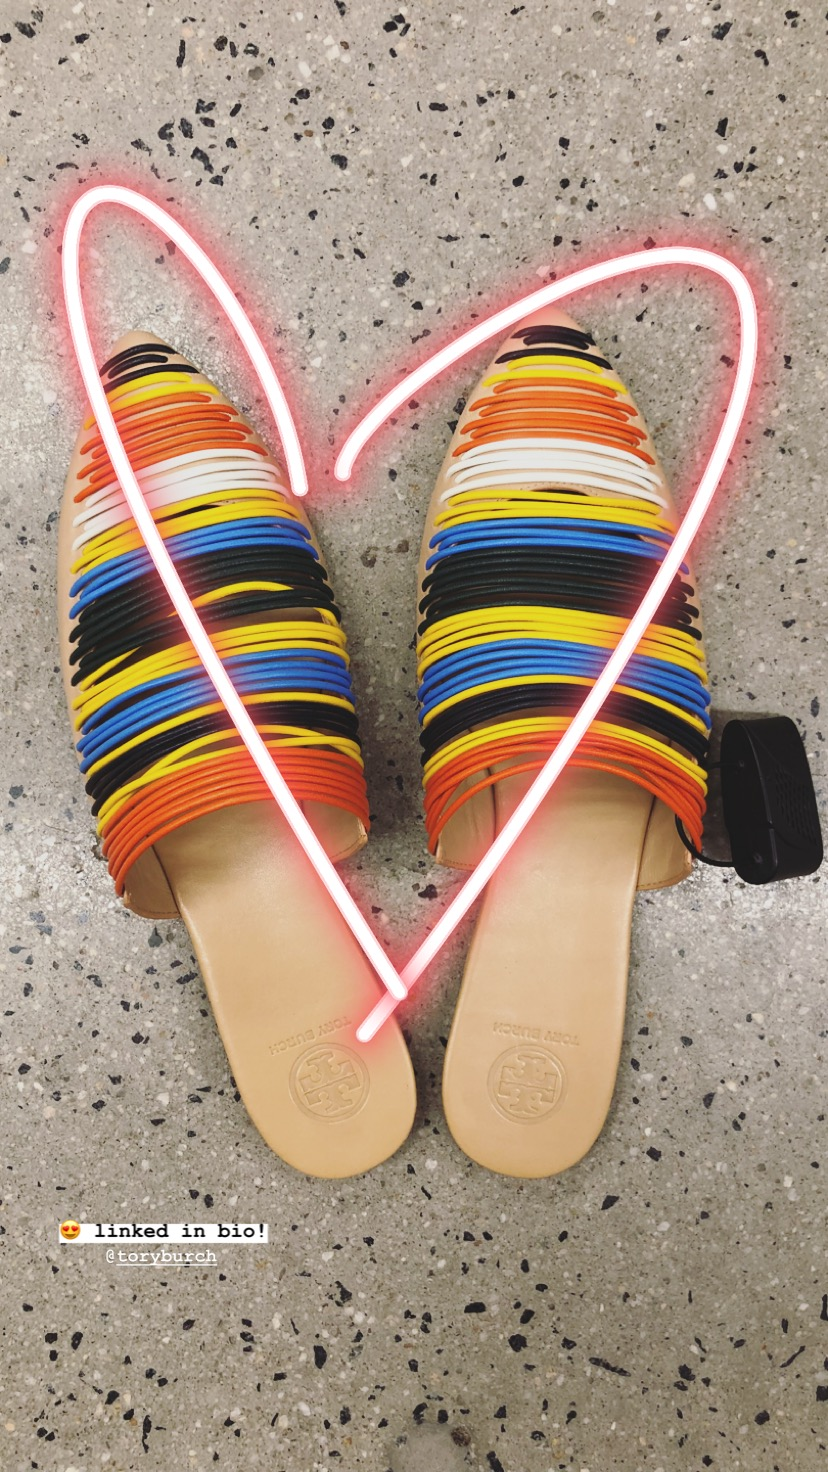 birchcollective-shop-instagram-story-july-7-2018-Tory-Burch-sienna-Slides-nordstrom-rack-charlotte-nc